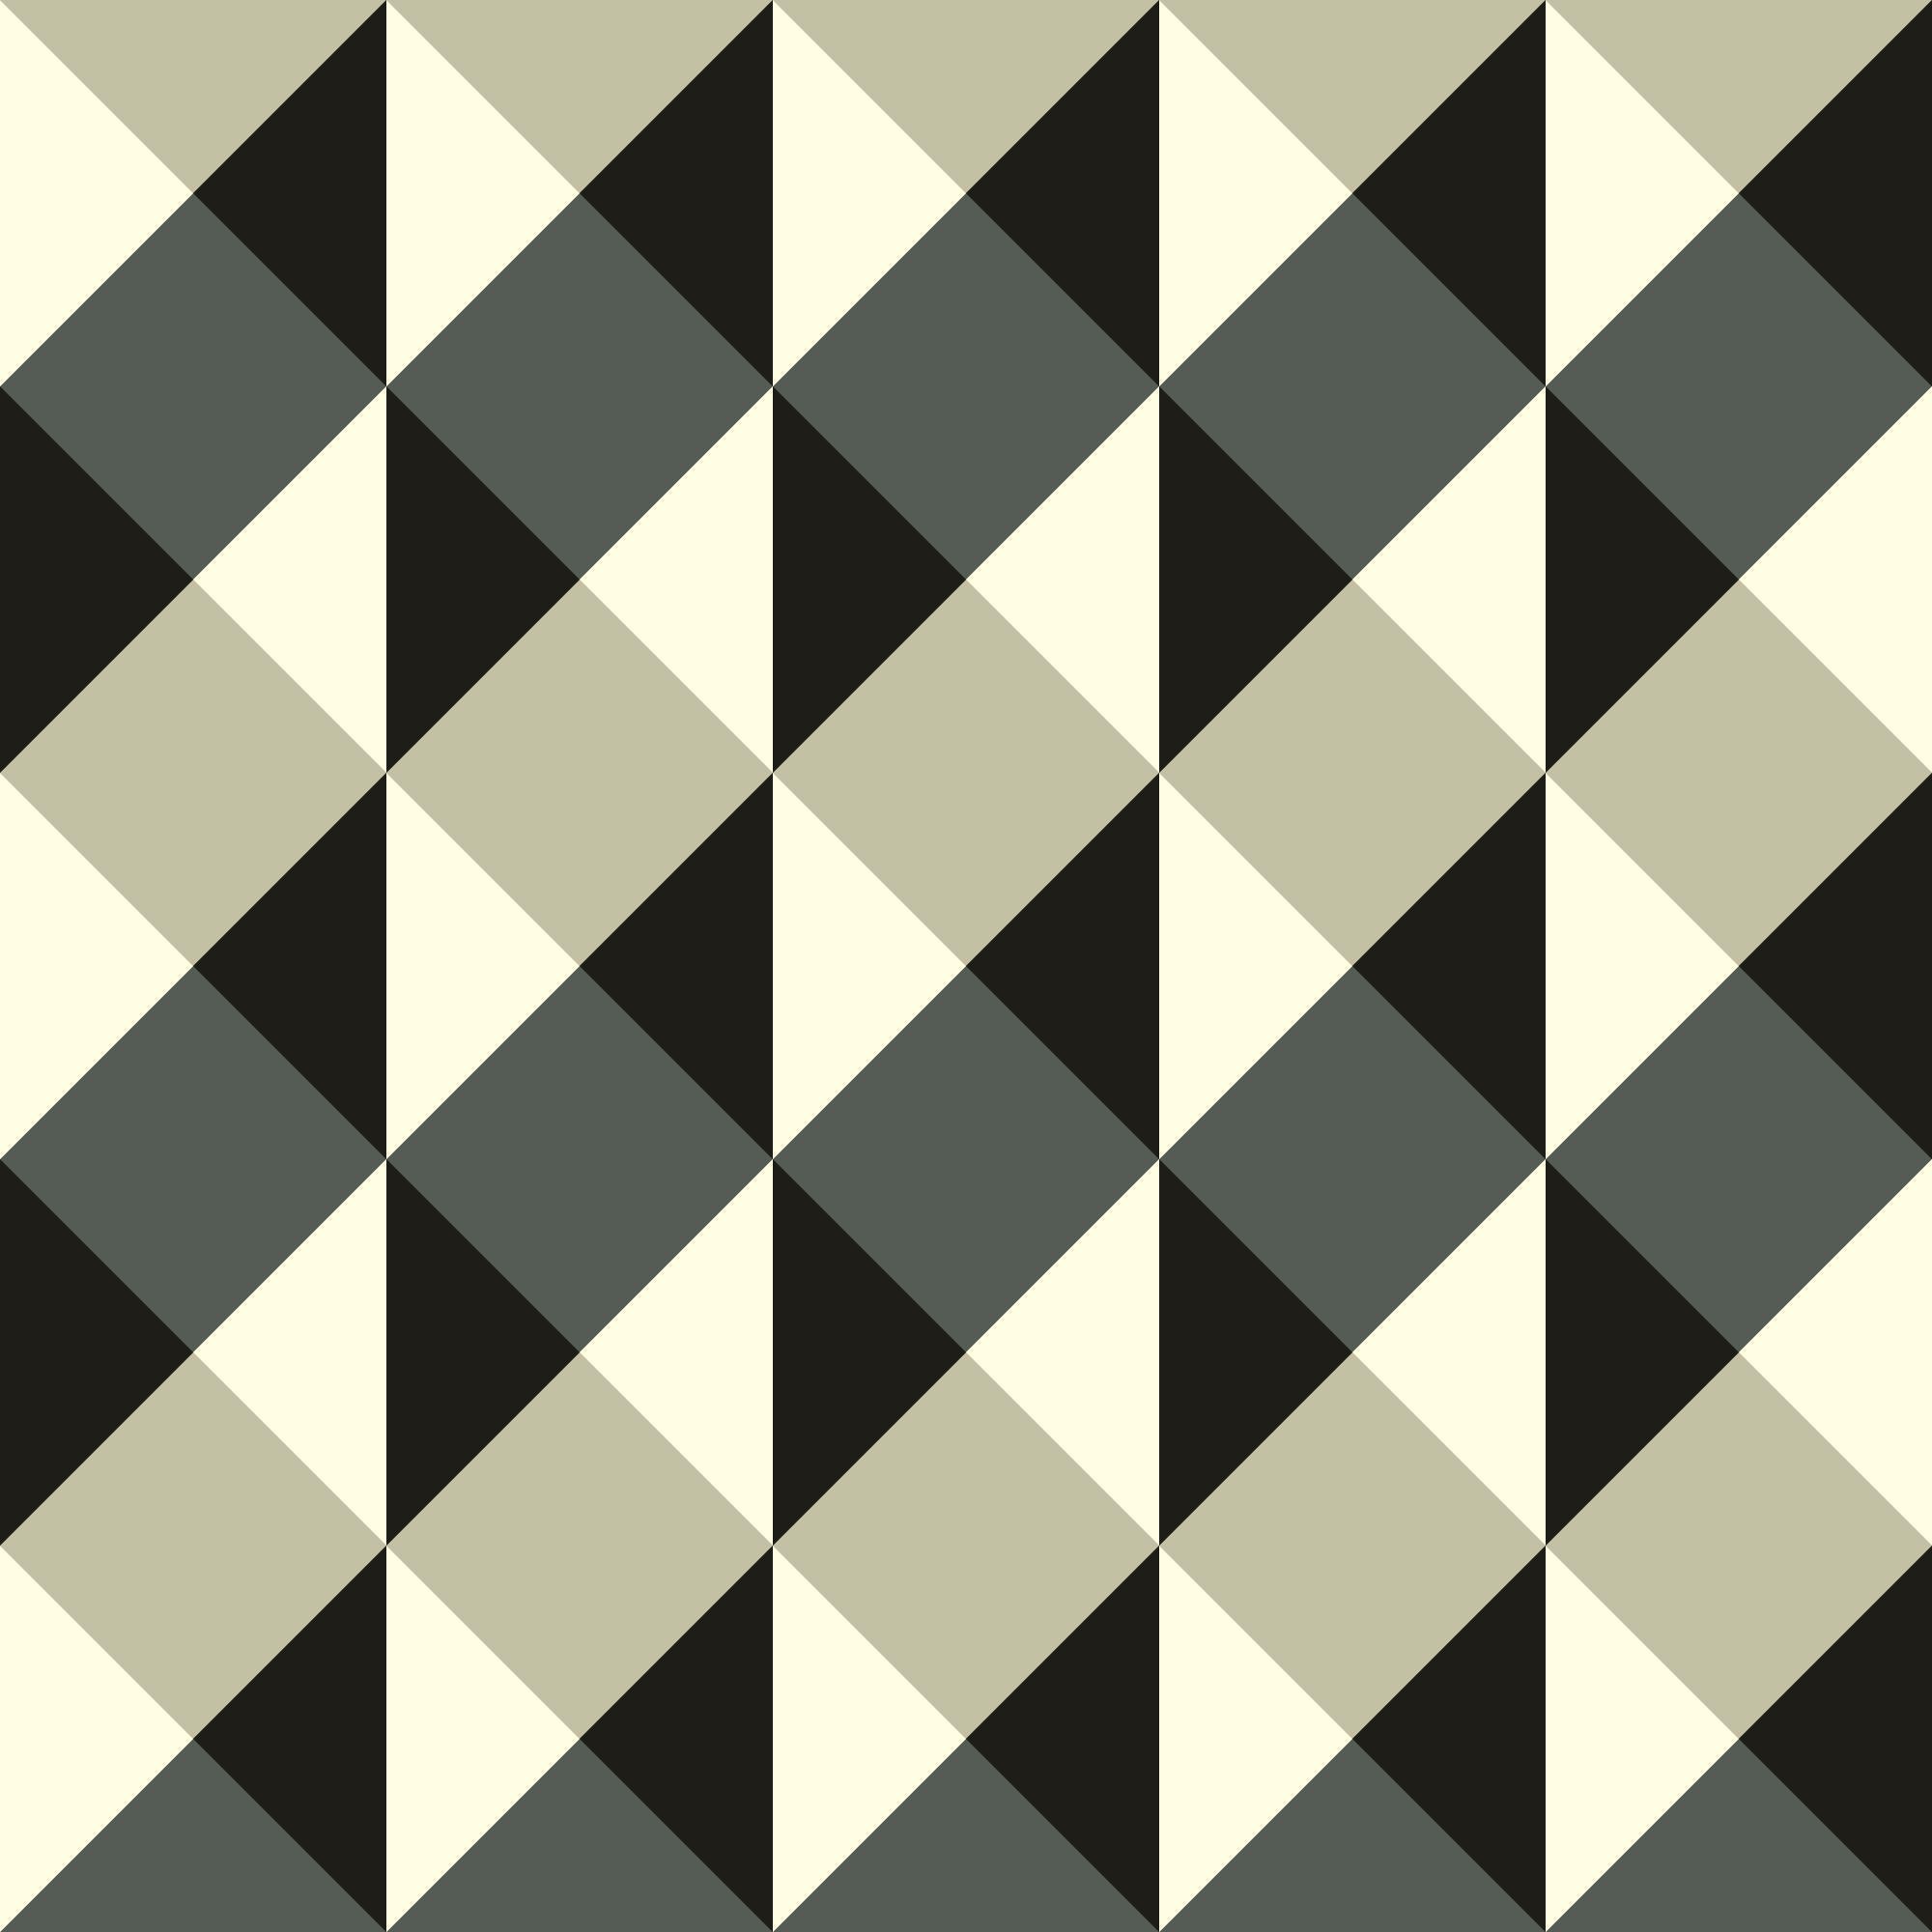 Abstract Geometric Triangle Seamless Pattern Abstract Blackcarpetseamless Geometric Pa In 2020 Geometric Triangle Seamless Patterns Black Carpet